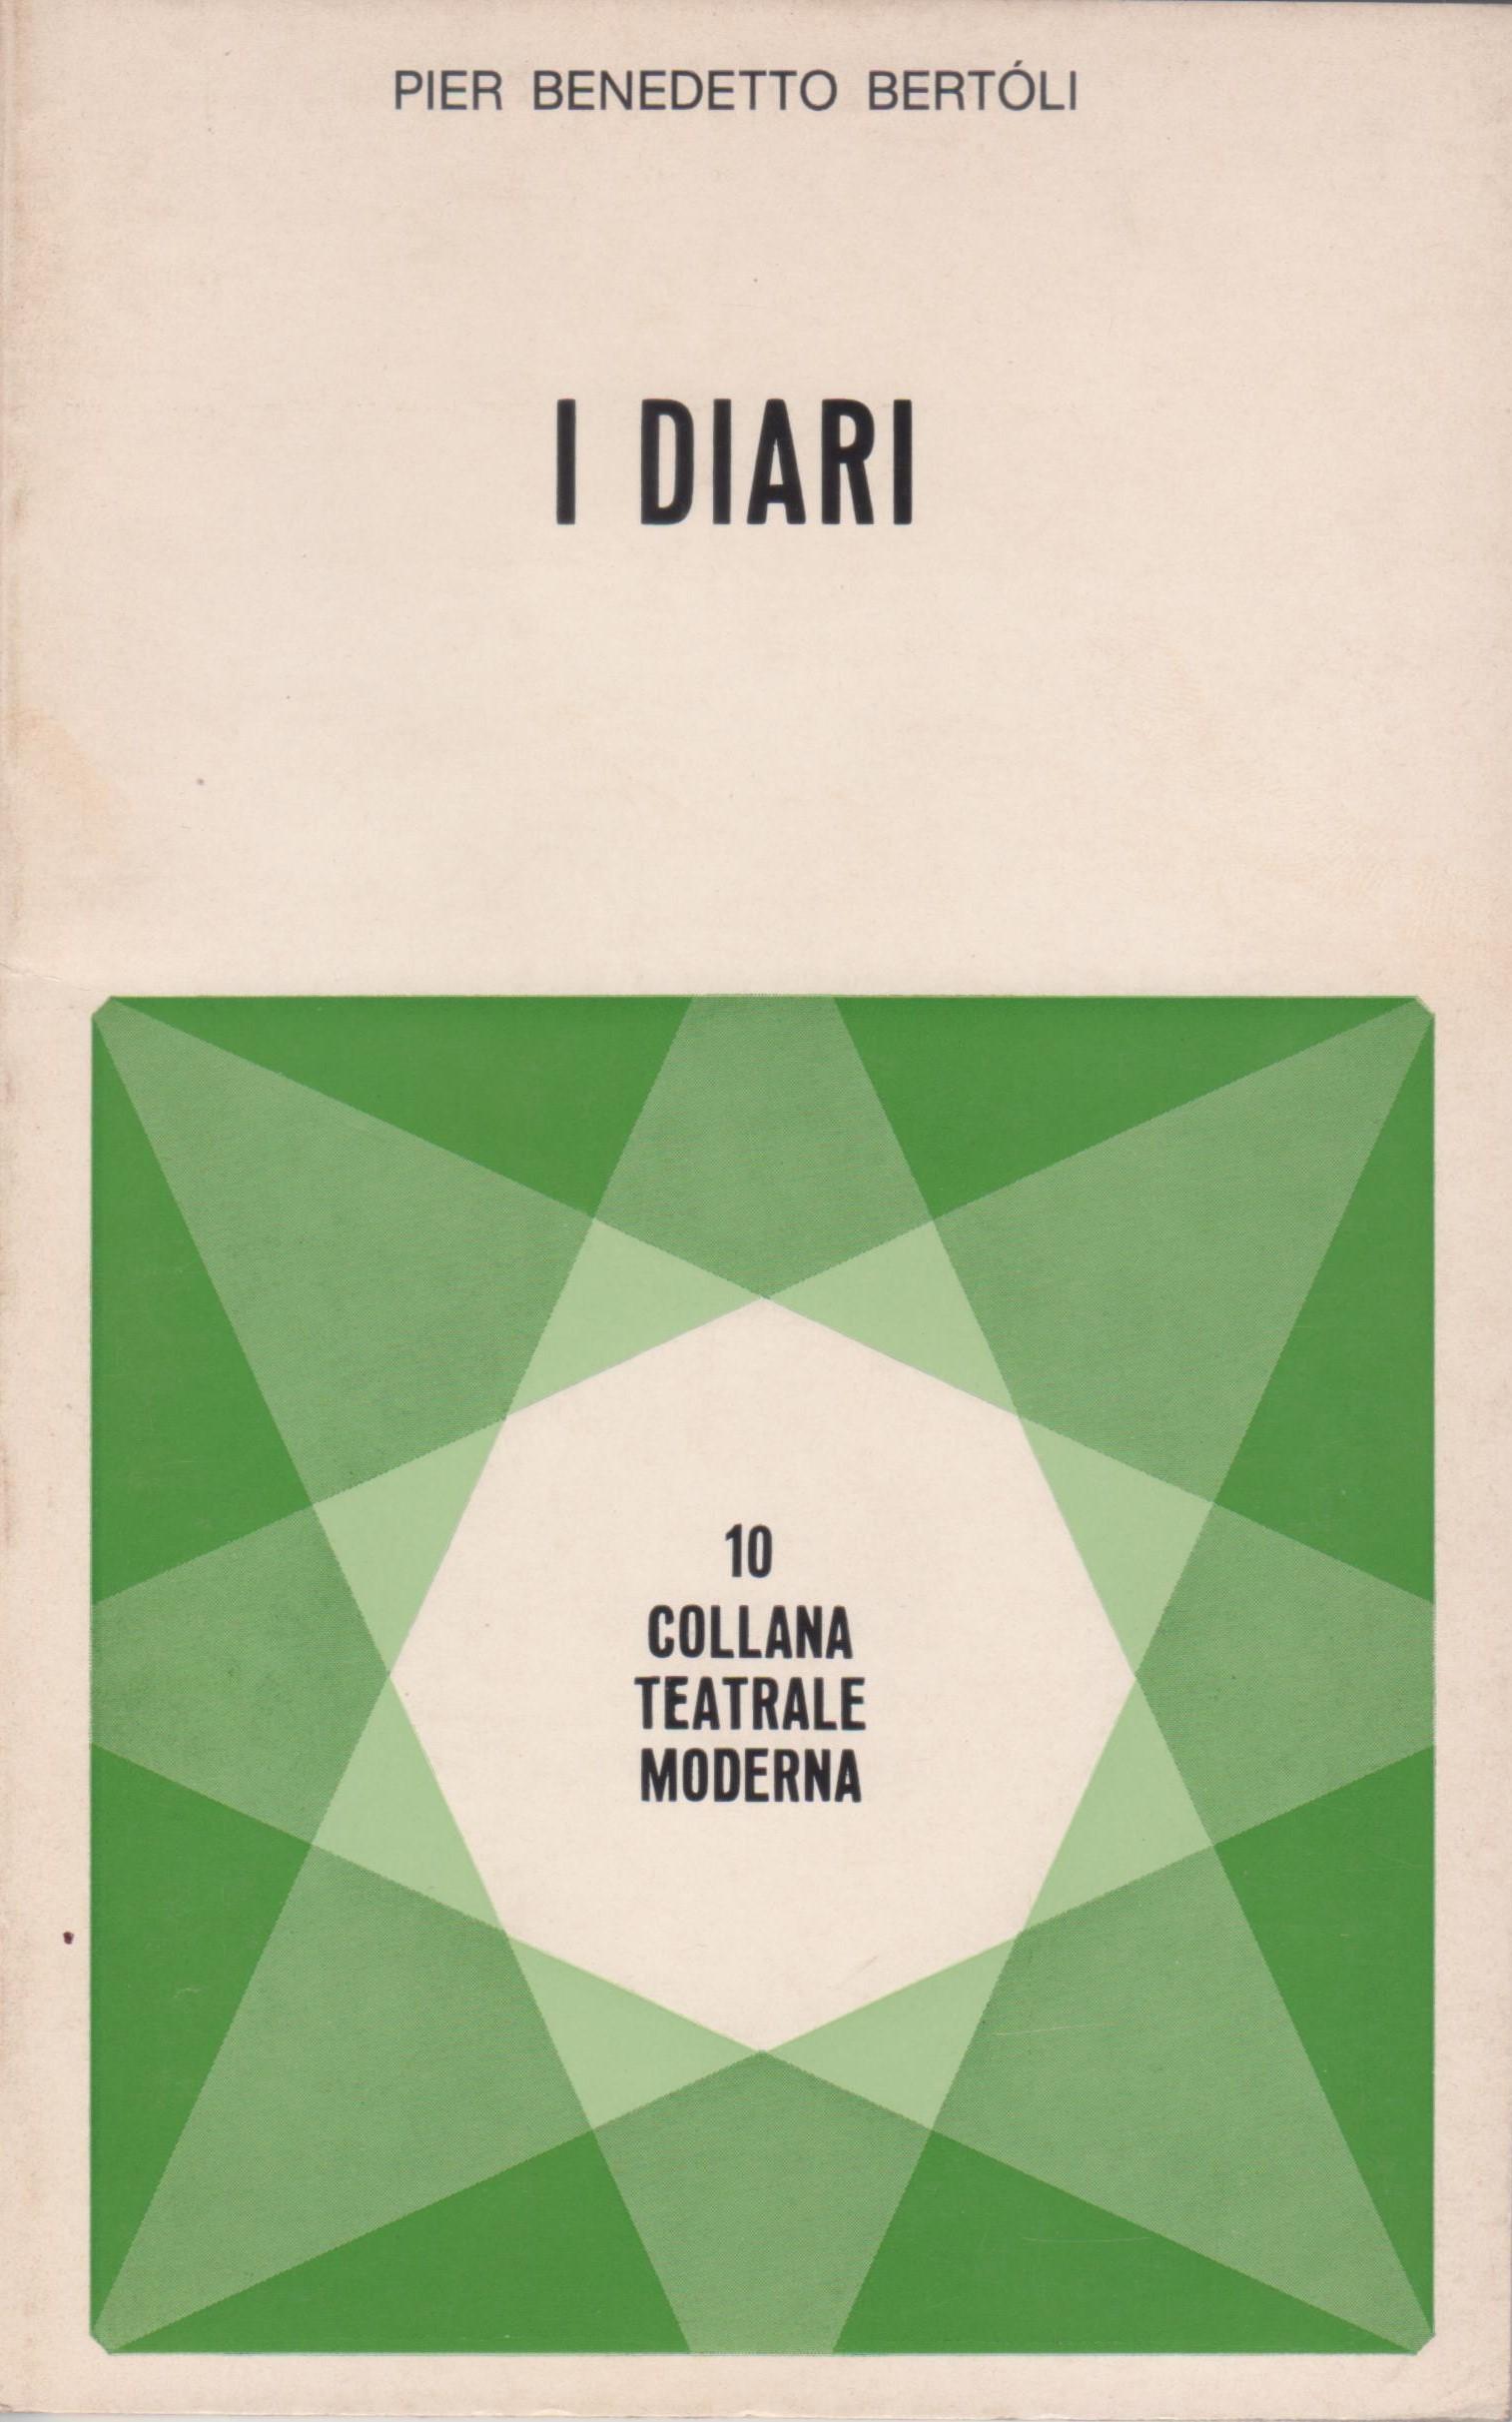 I diari